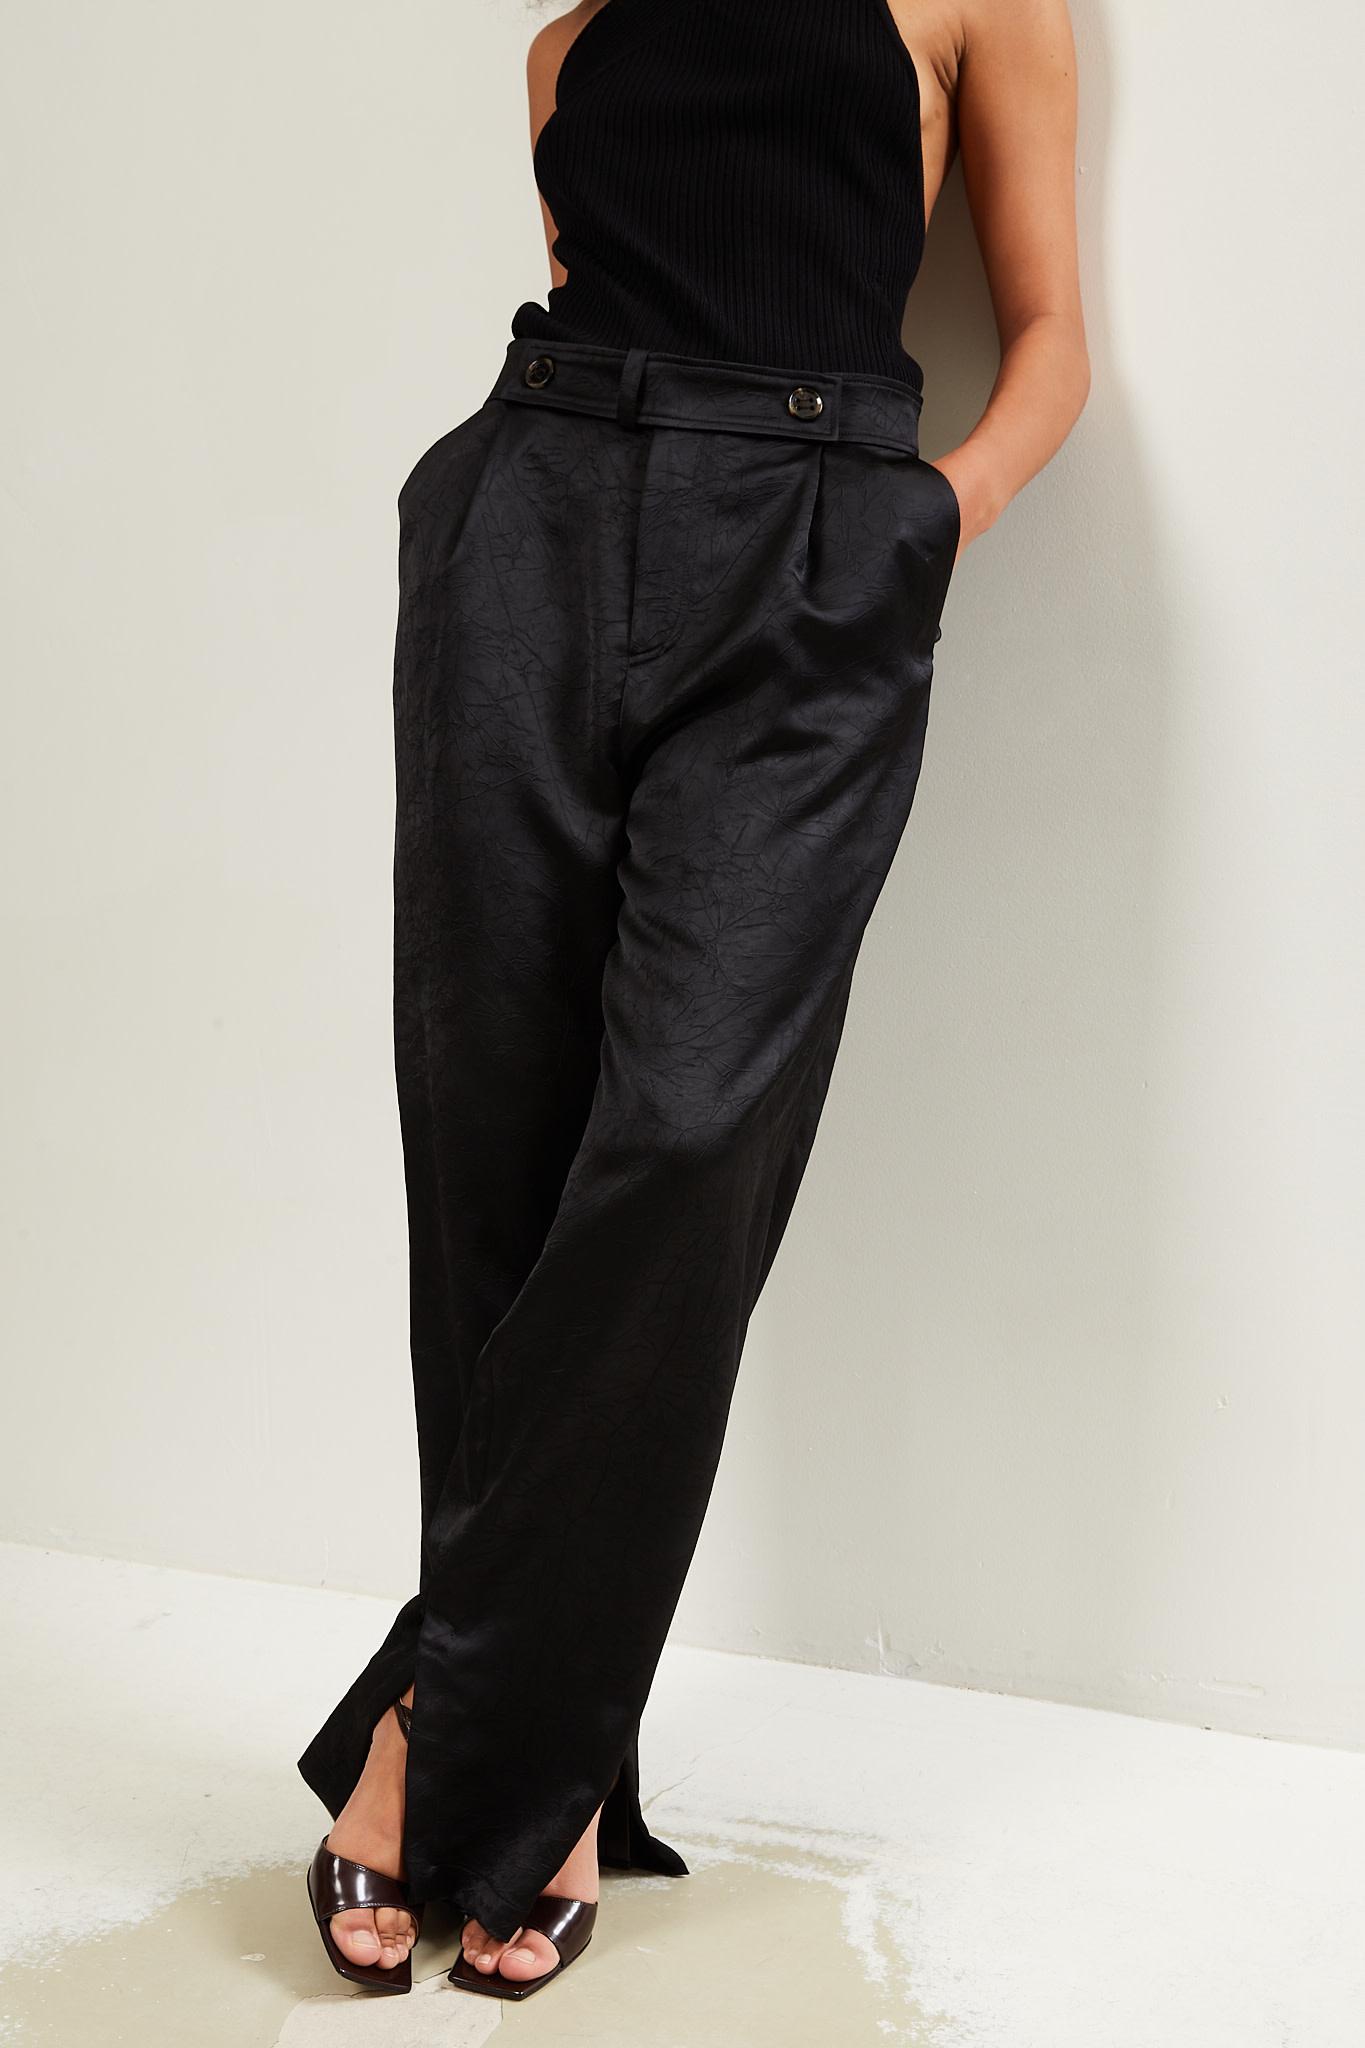 Aeron Odile crinkled satin trousers